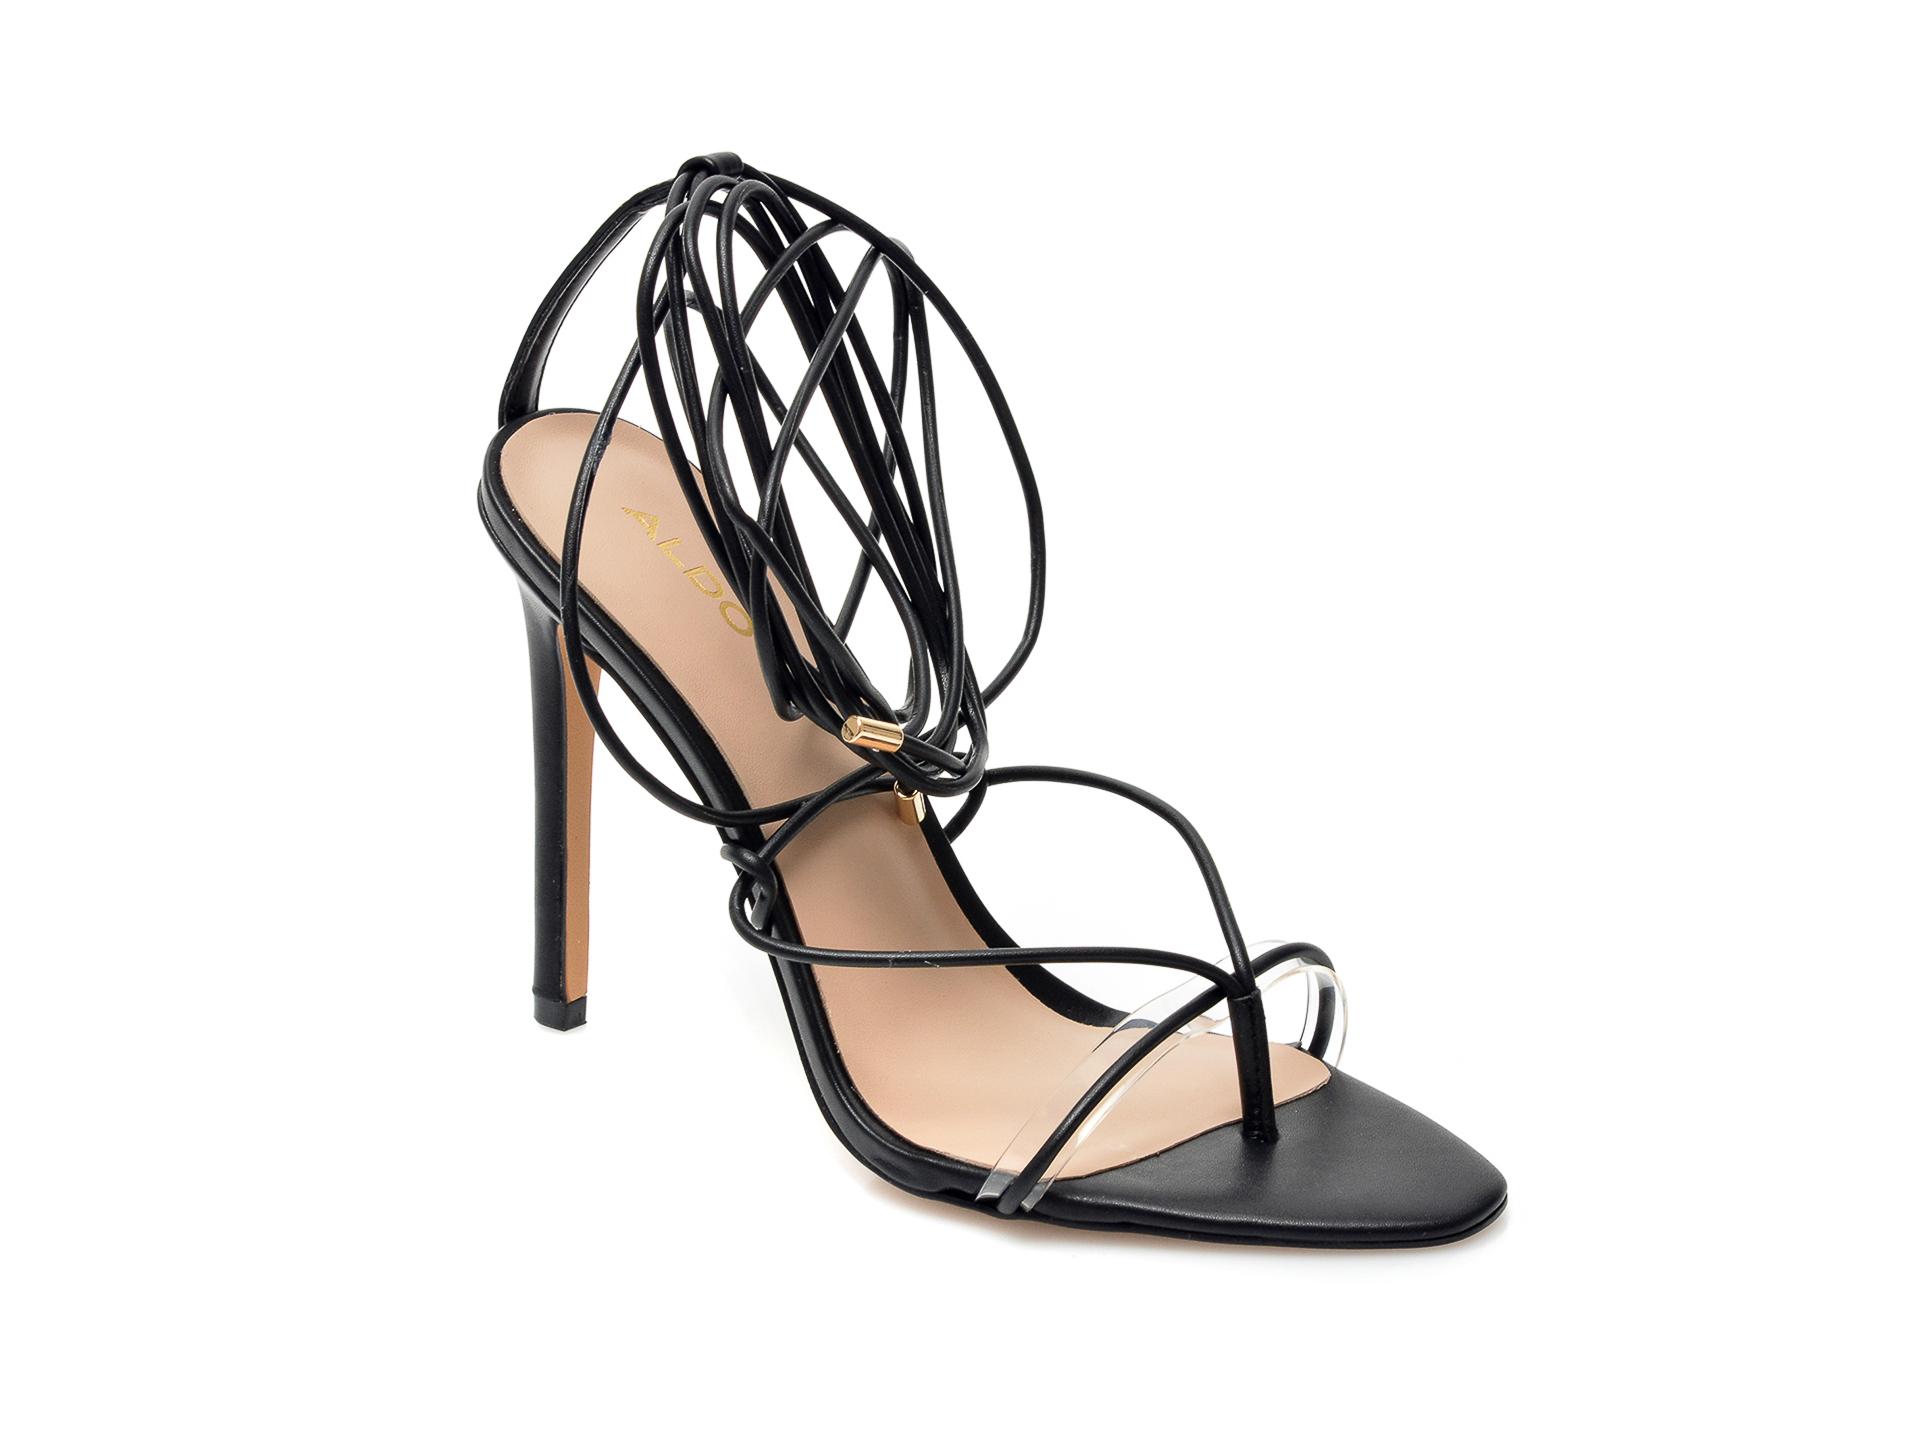 Sandale ALDO negre, Glaosa001, din piele ecologica imagine otter.ro 2021